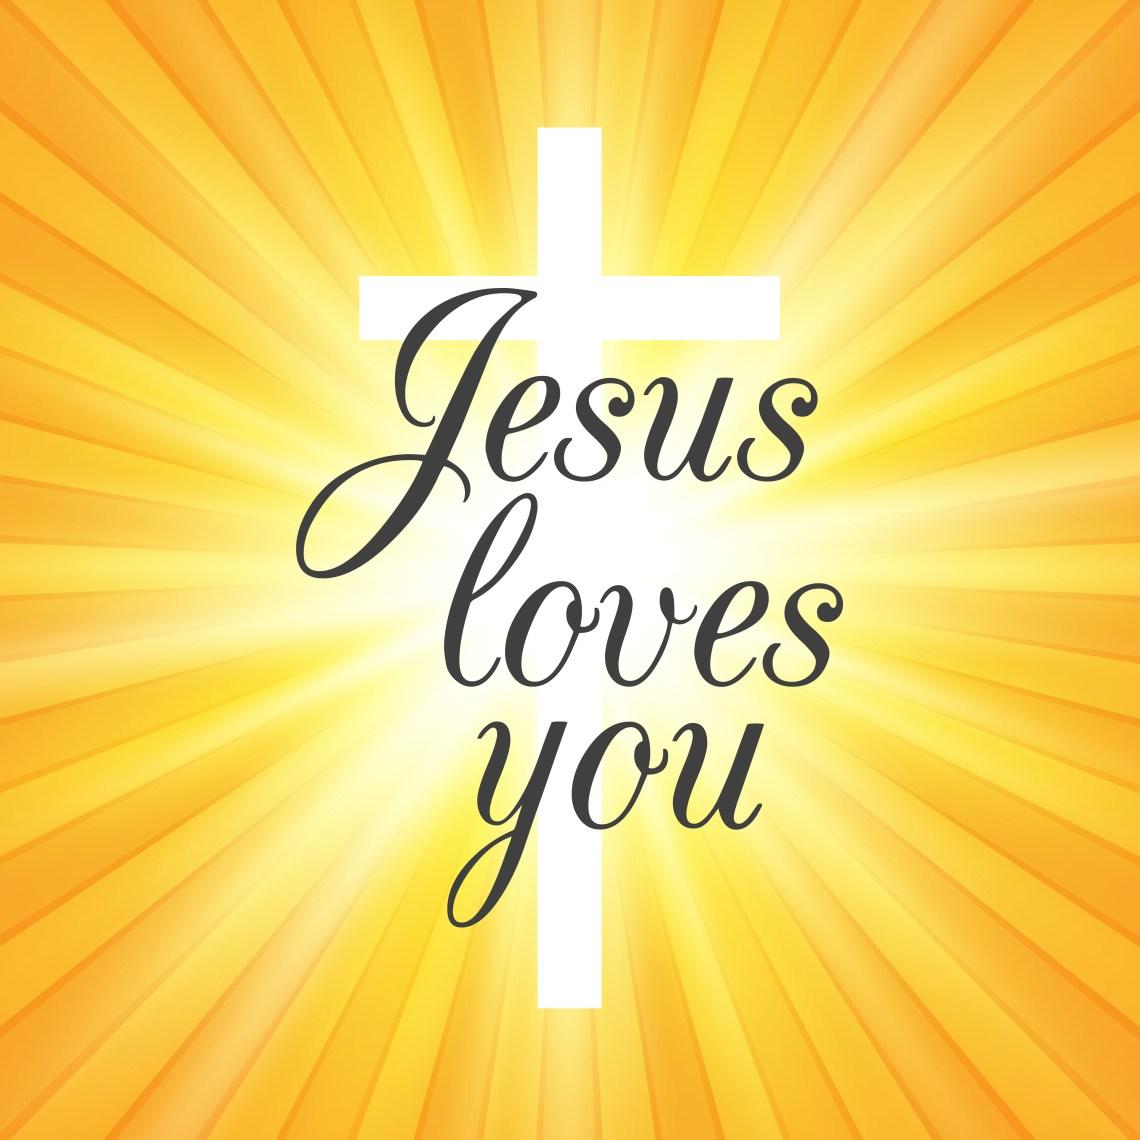 Download Jesus Loves You Free Vector Art - (10 Free Downloads)